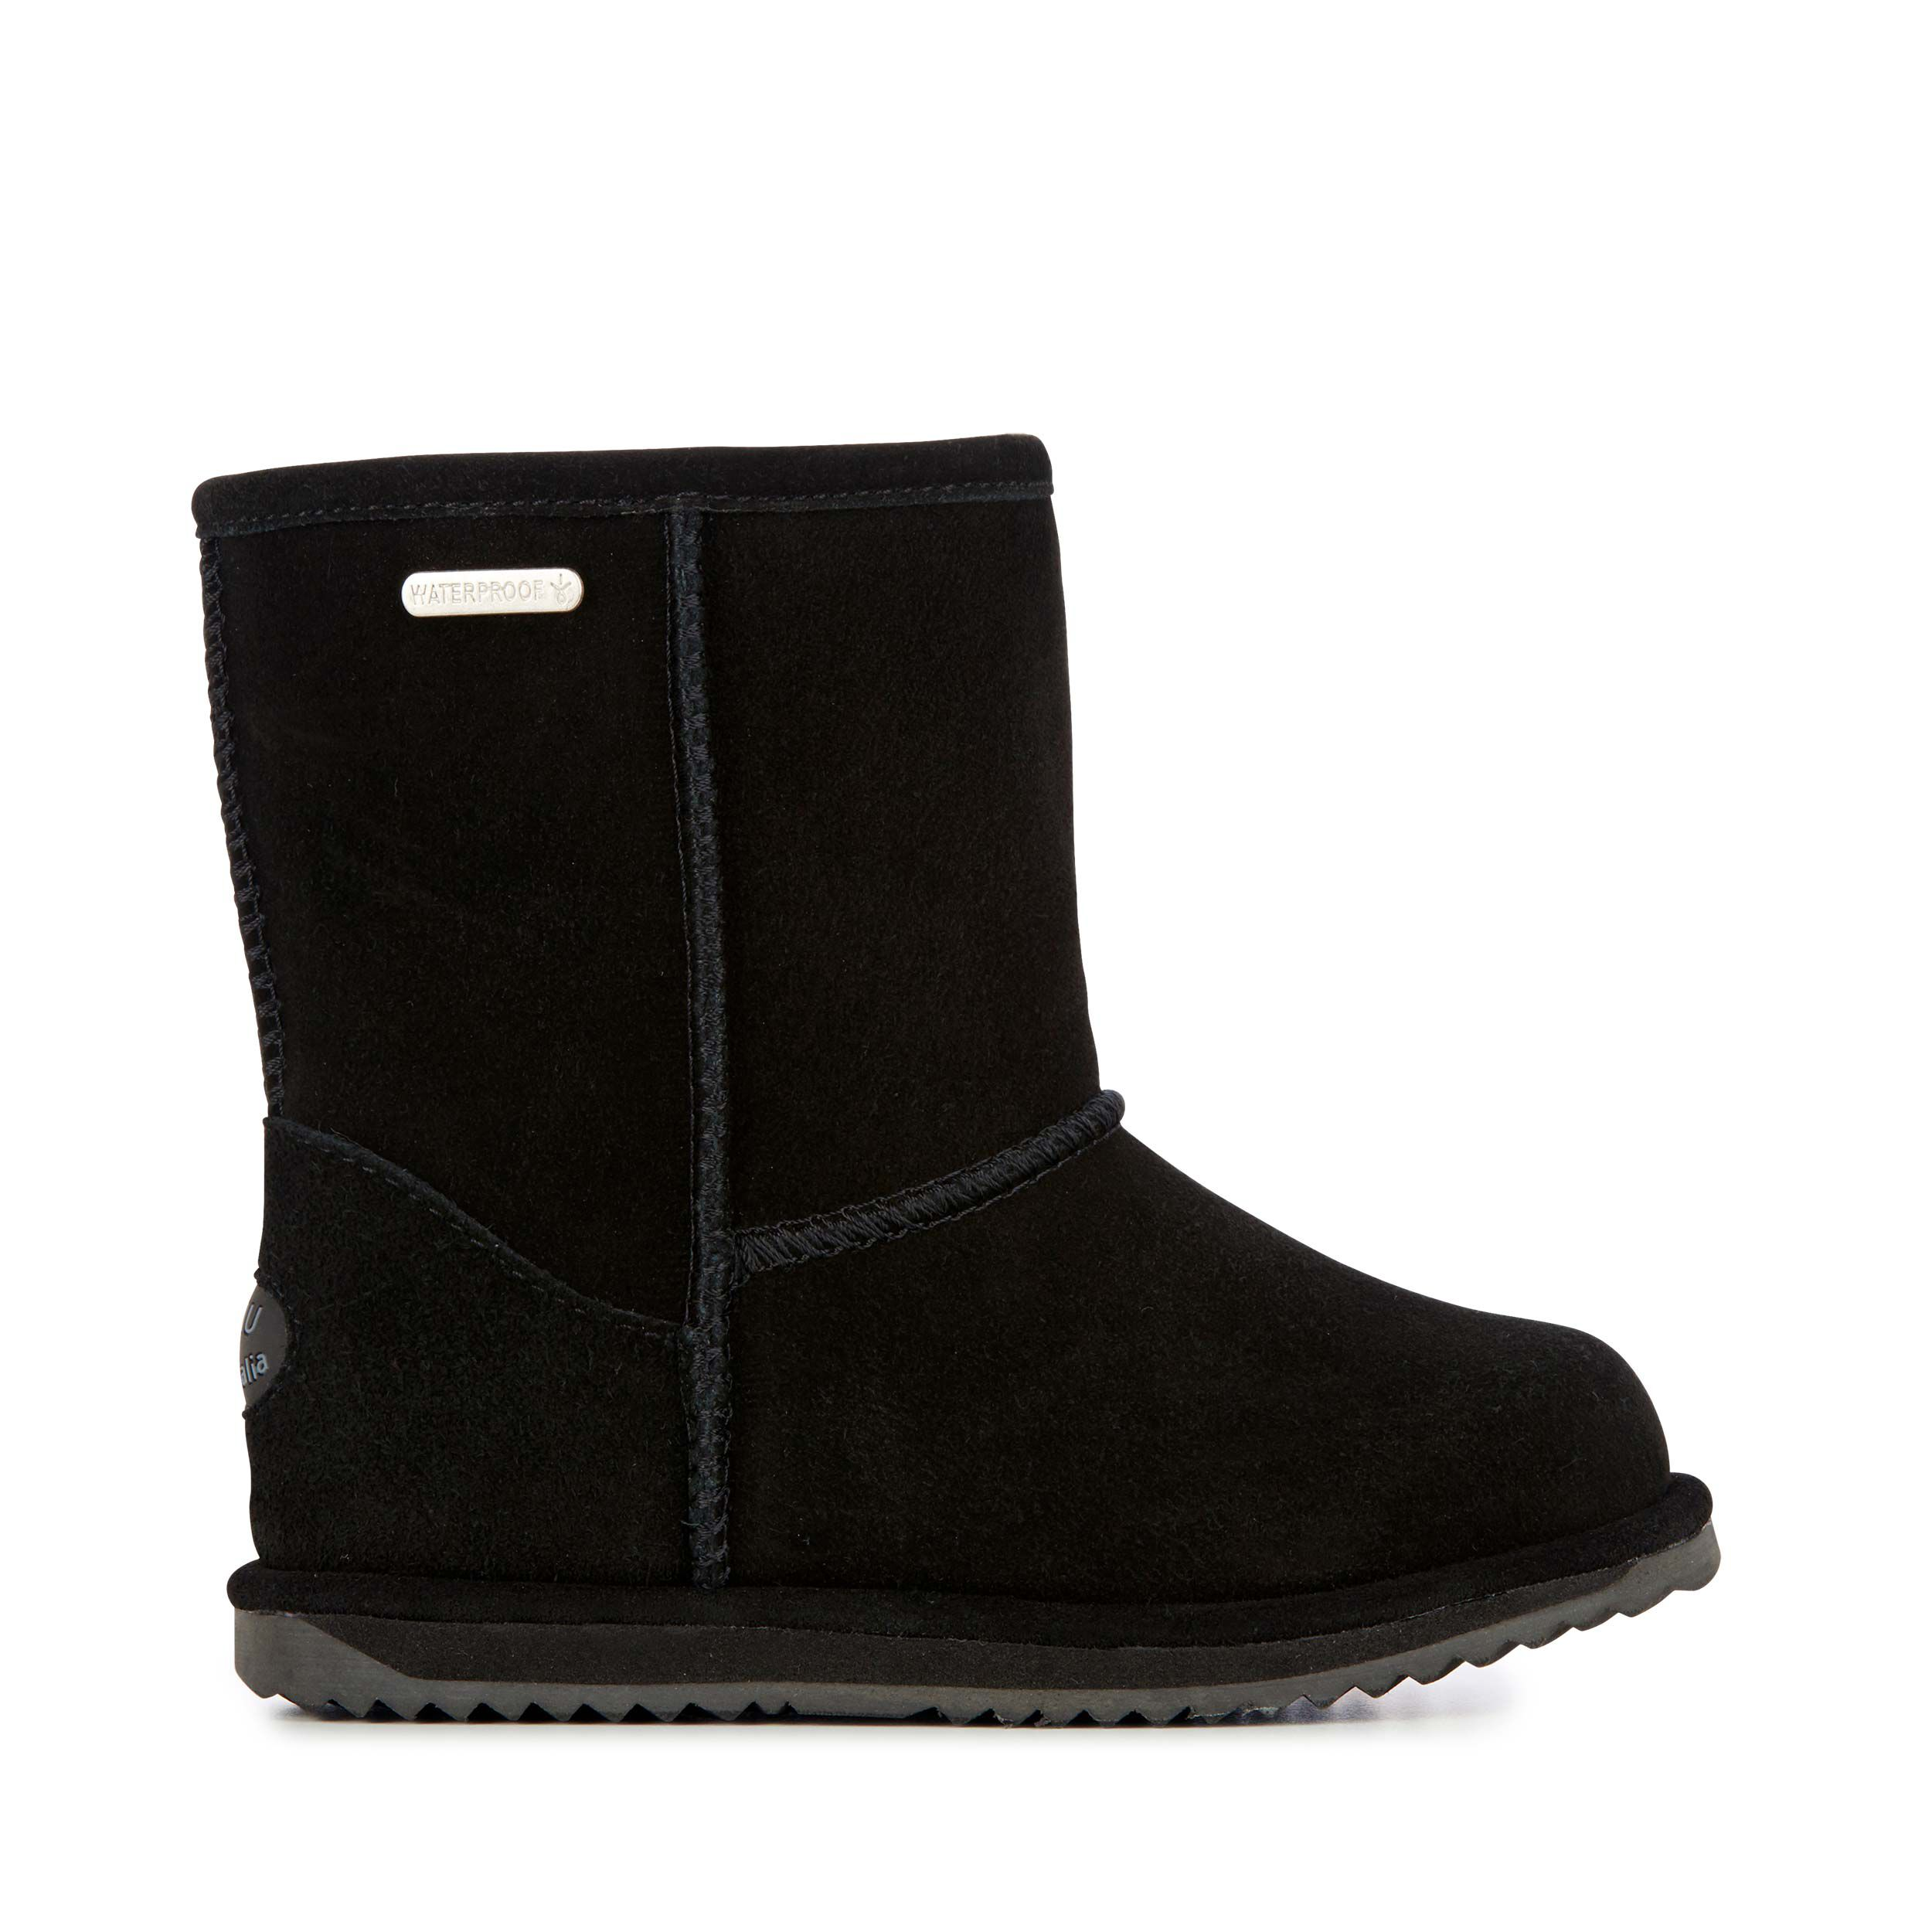 Teens Brumby Emu Kids Lo Boot Wool Australia Deluxe zPq6P